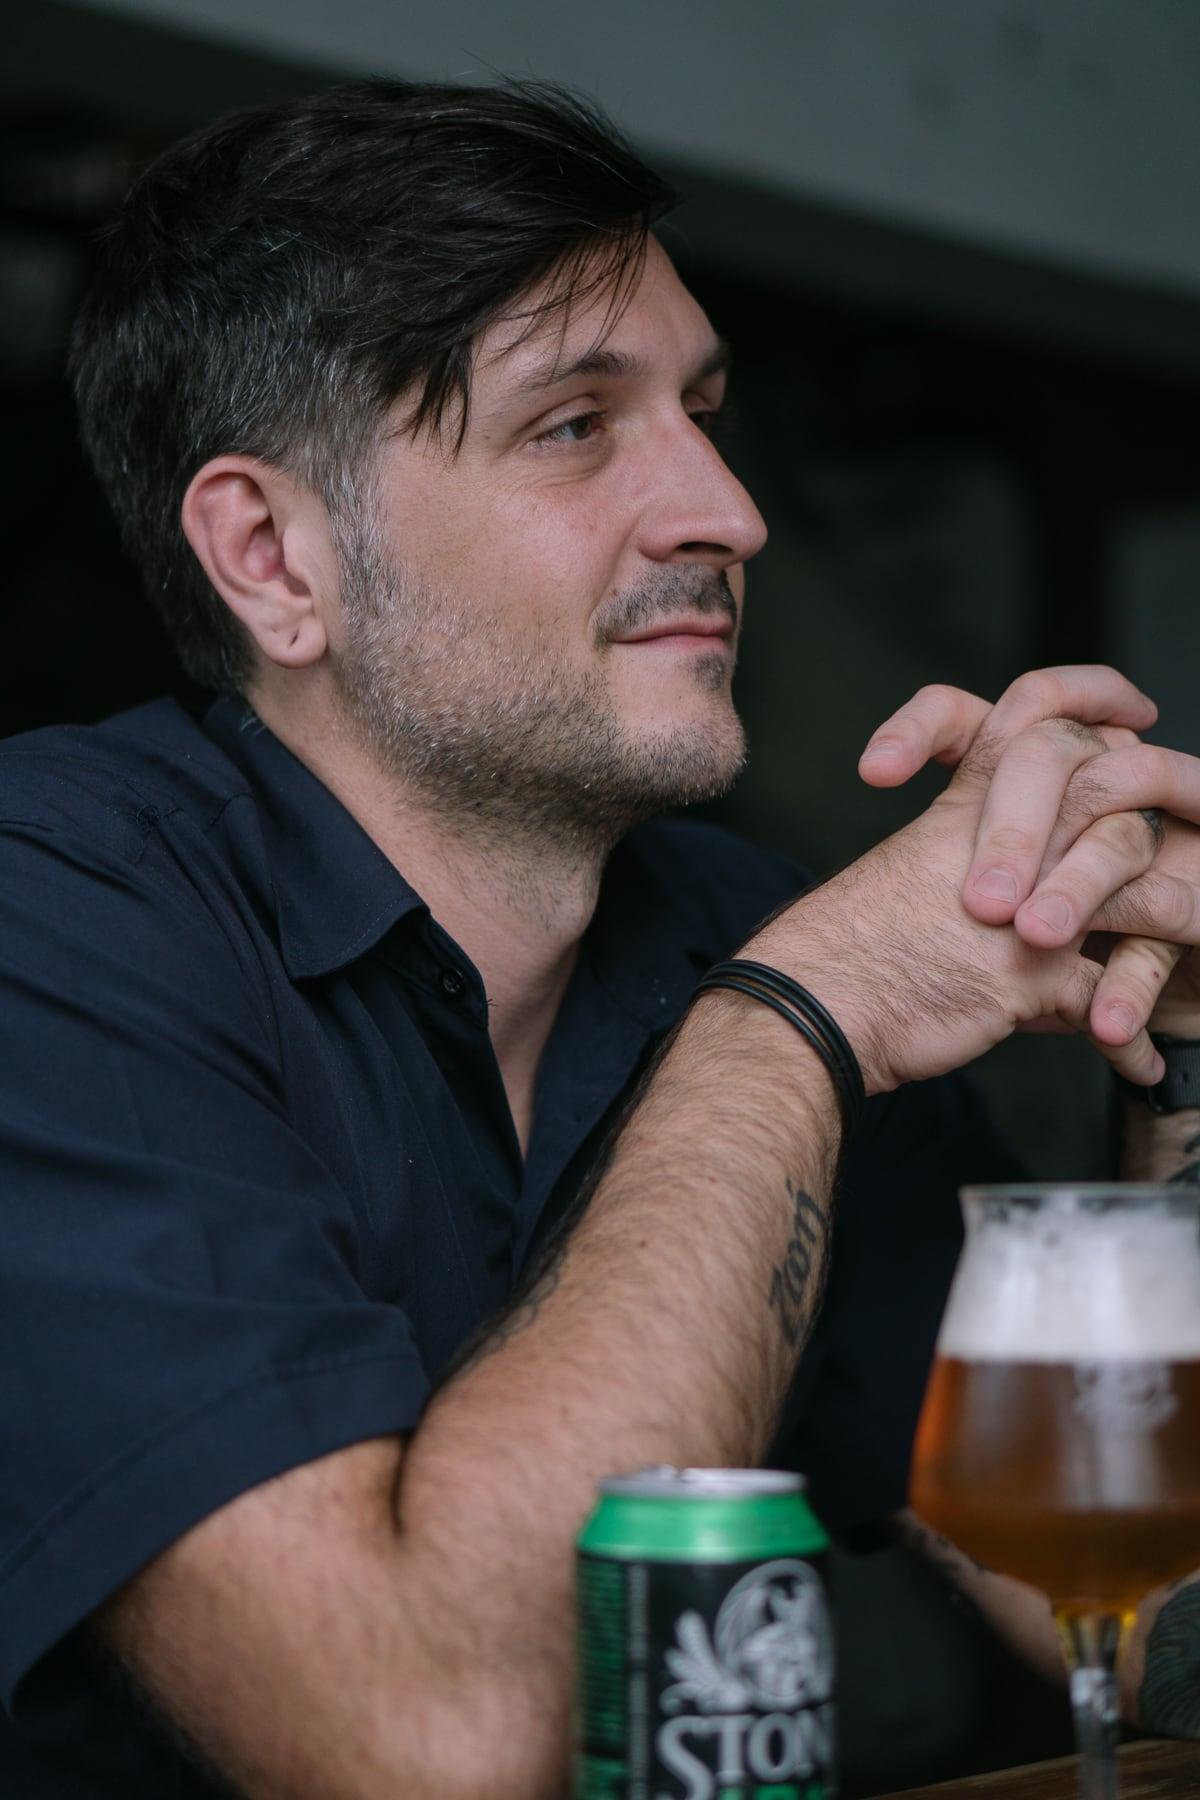 Beervana's Chad Mitchell